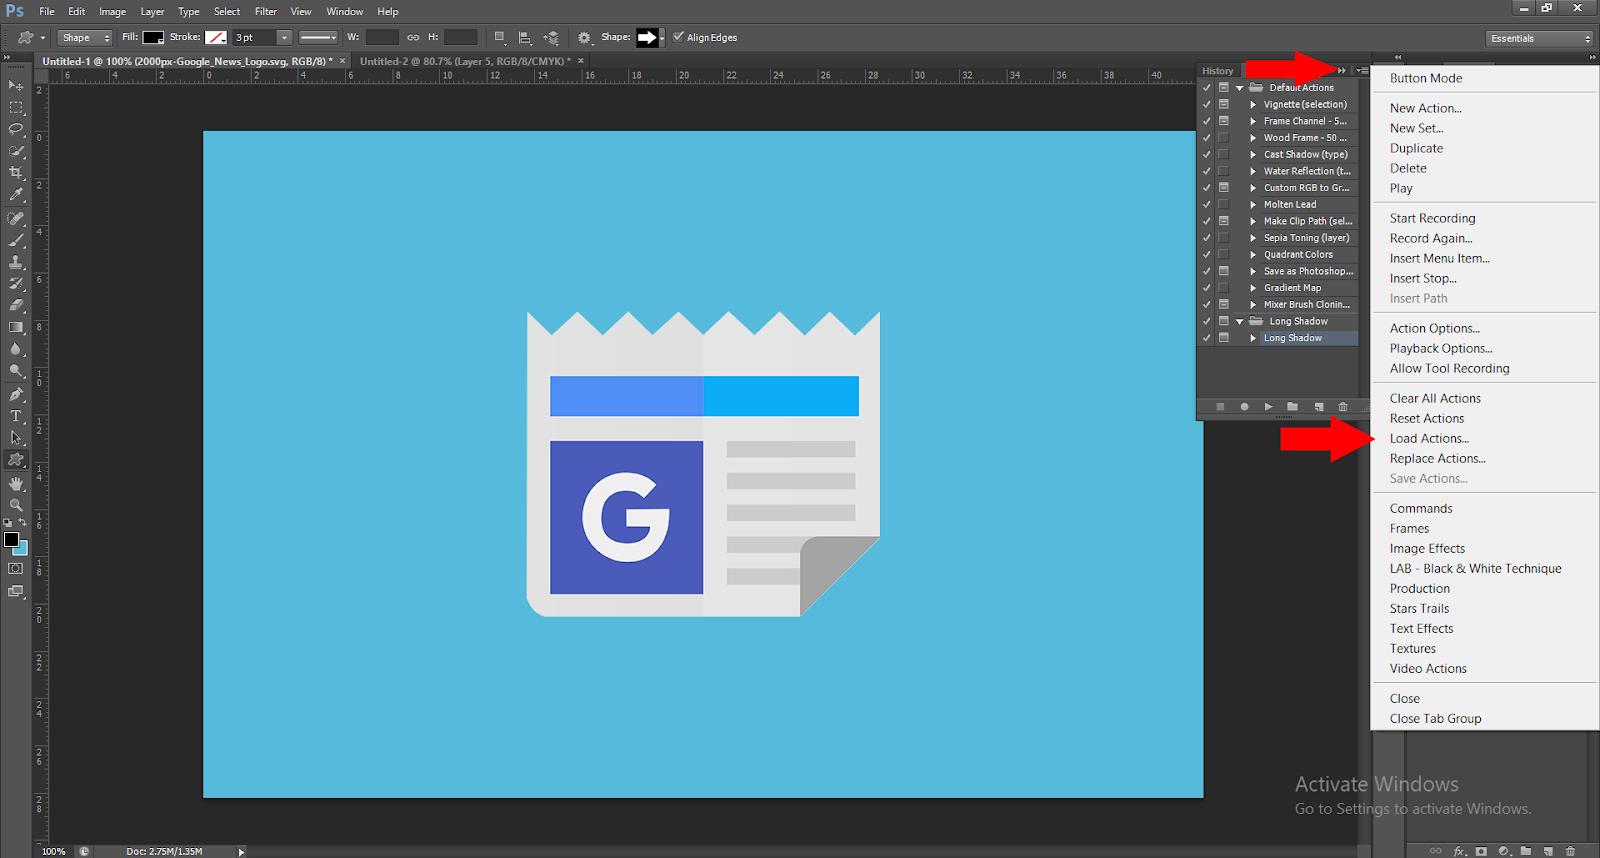 Cara Membuat Thumbnail / Gambar Postingan Keren